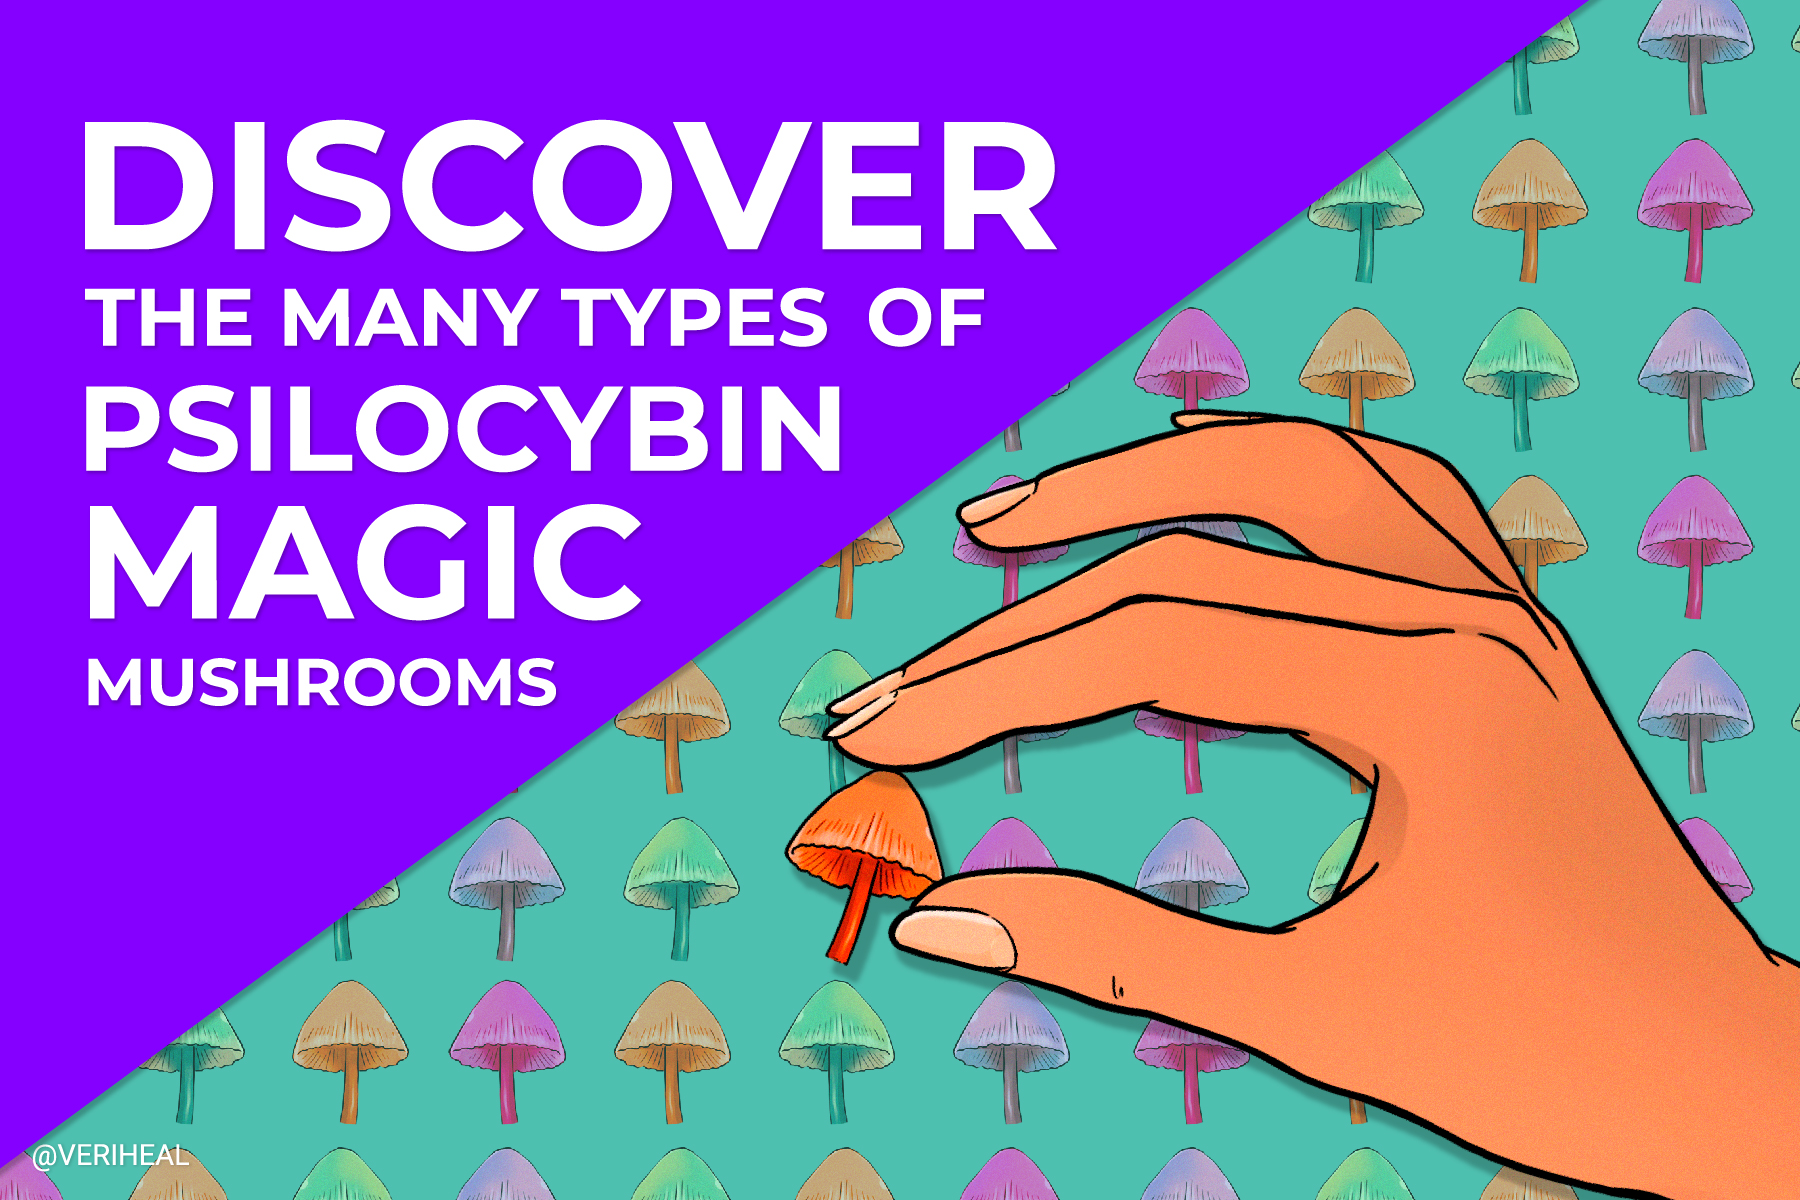 Discover the Many Types of Psilocybin Magic Mushrooms